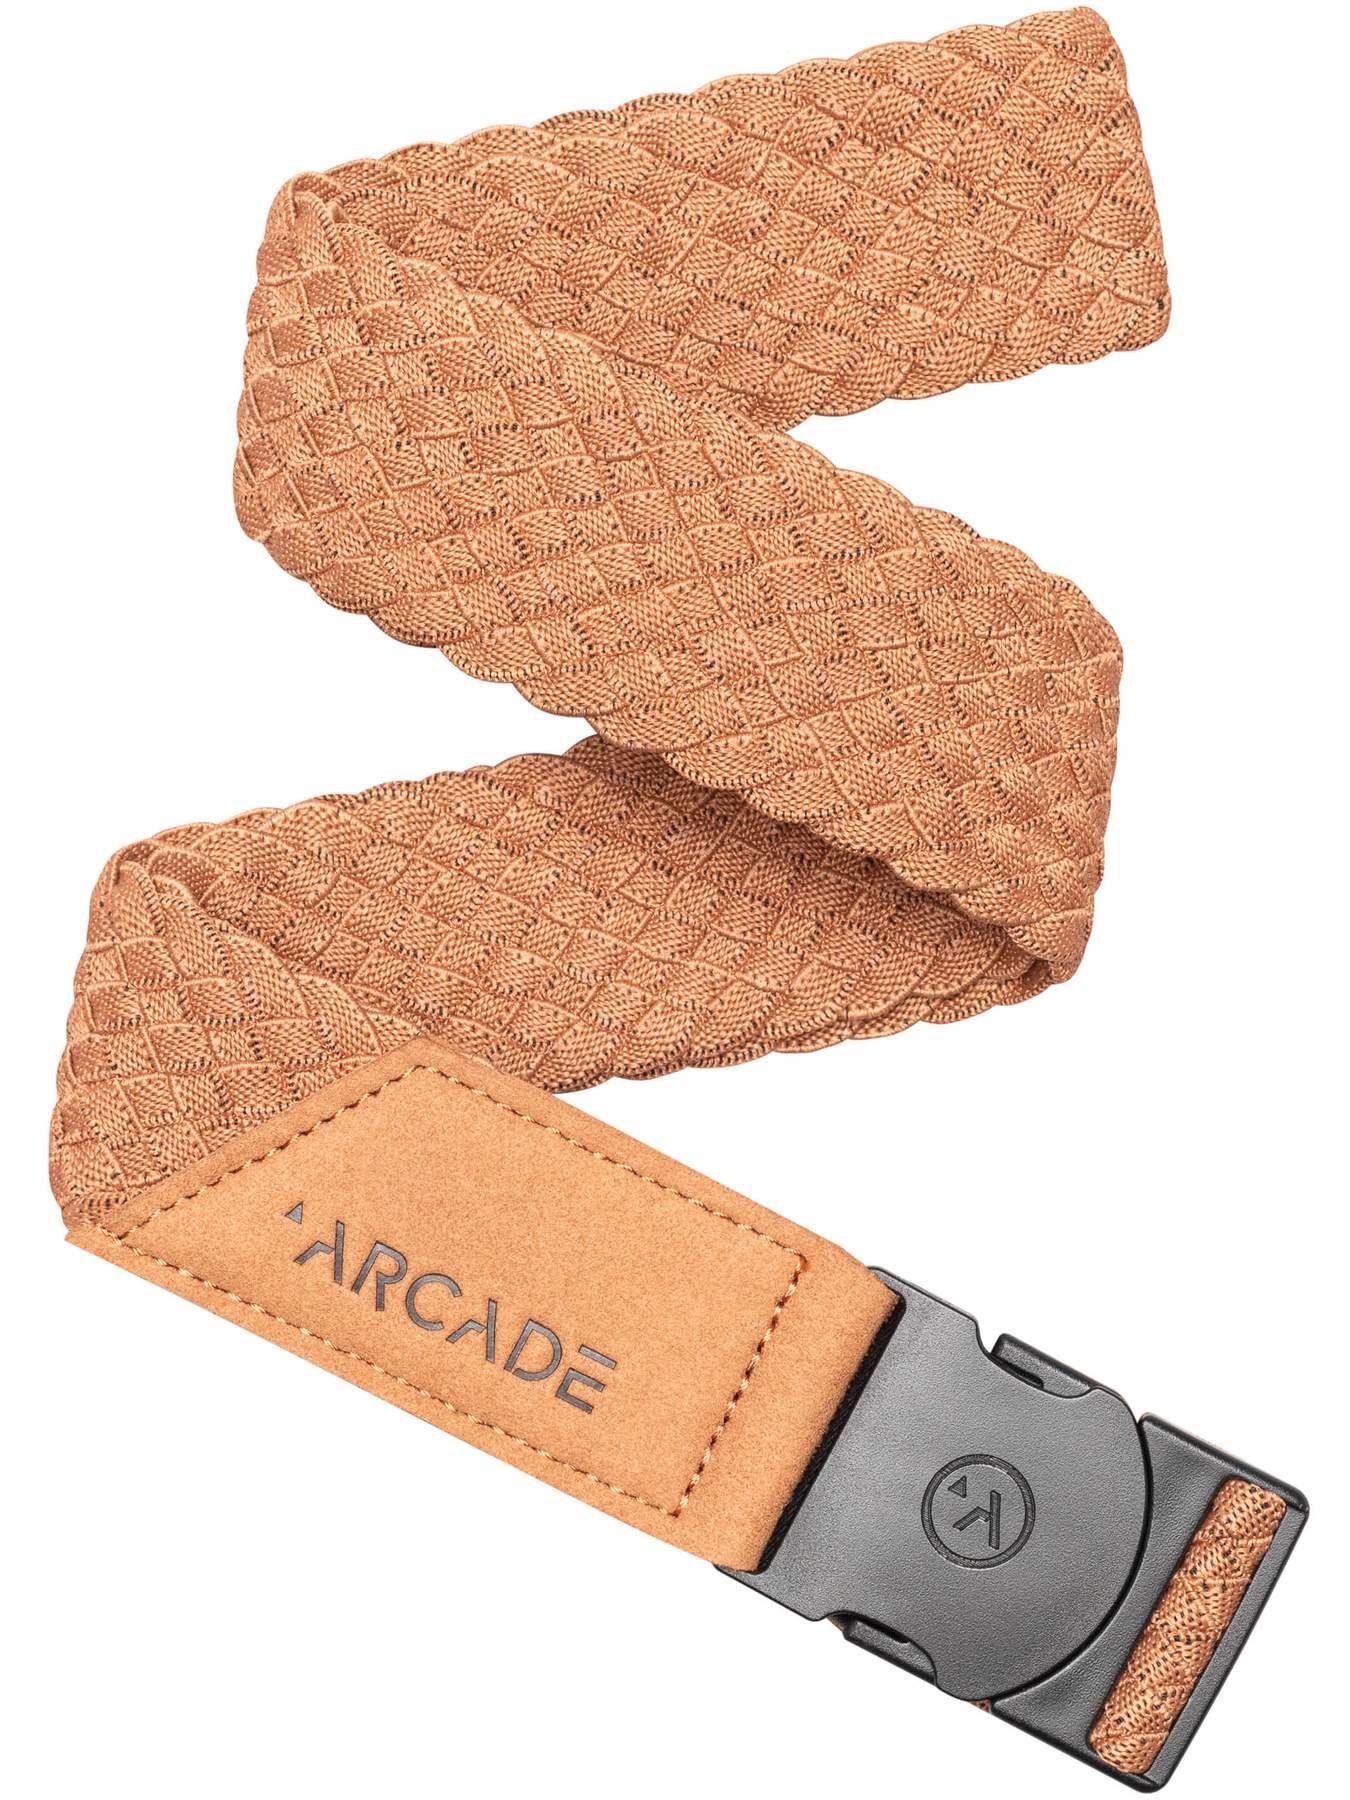 Arcade Arcade Vapor Belt (S20/W21)